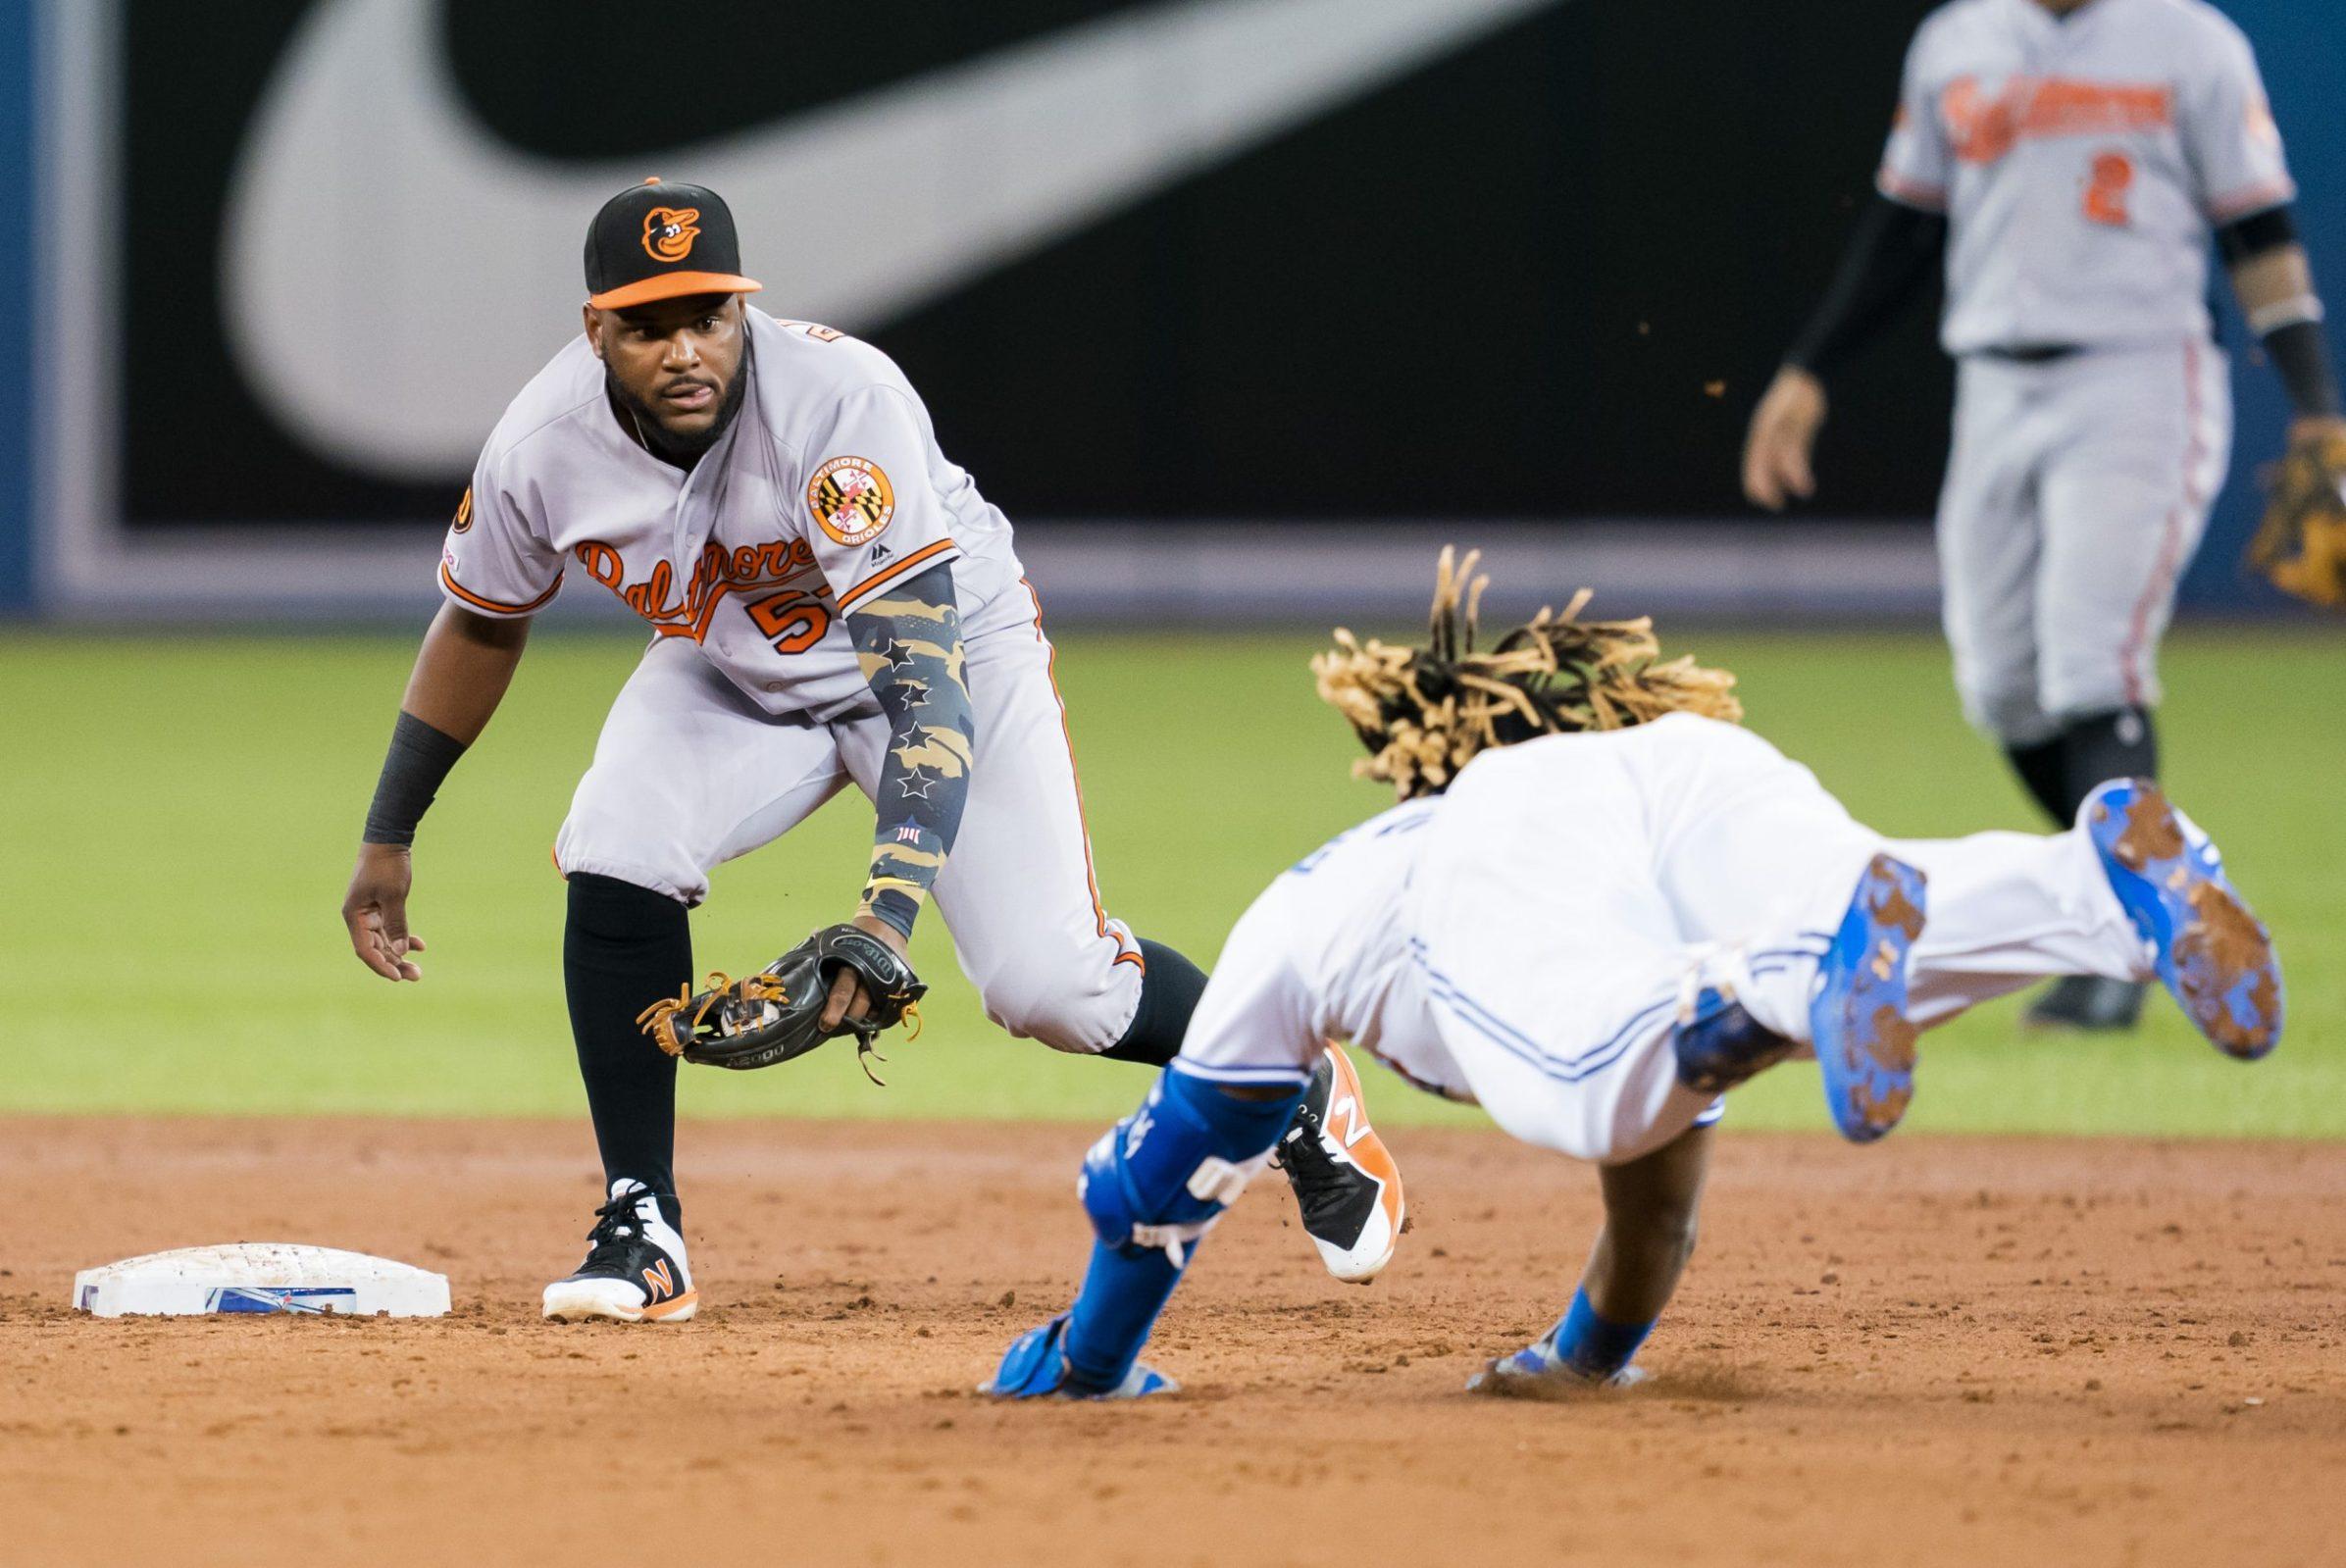 Vladimir Guerrero Jr. slides into second base against the Orioles.